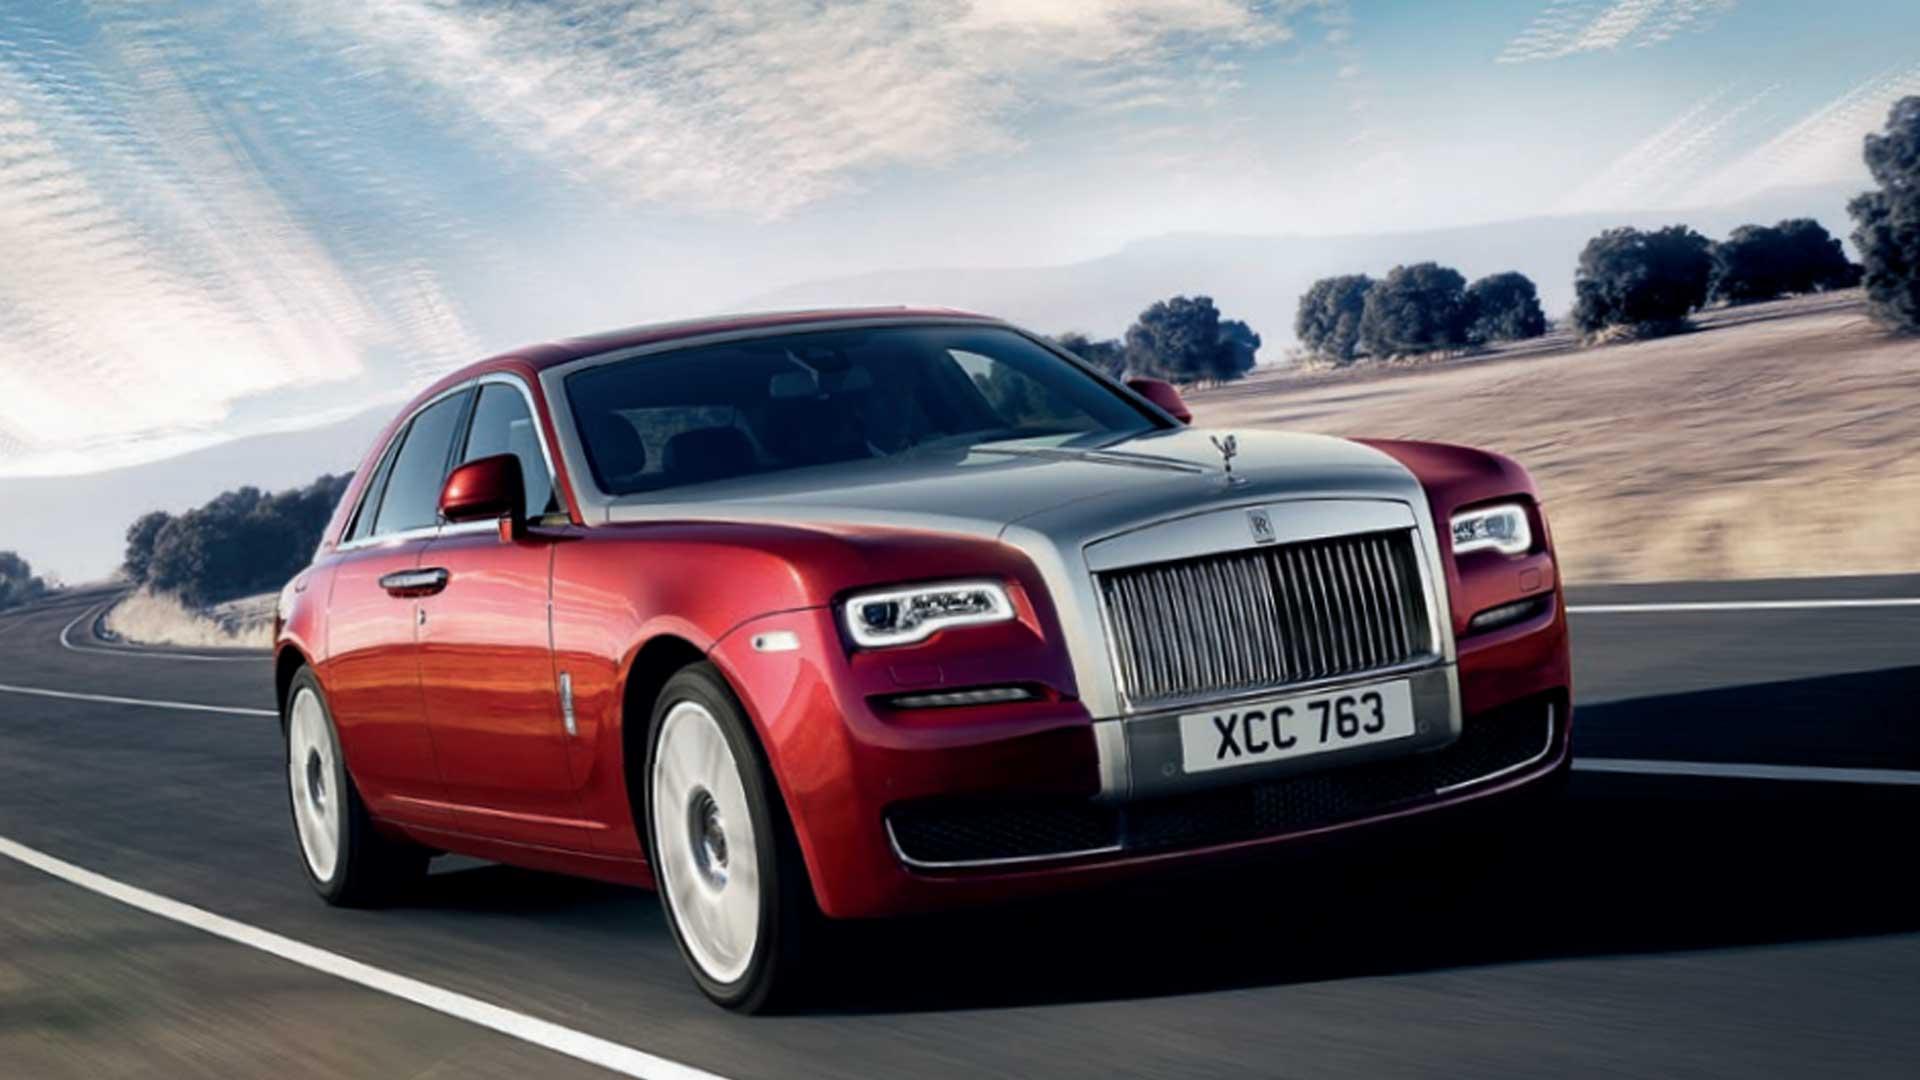 Rolls Royce Ghost Series II 2015 SWB